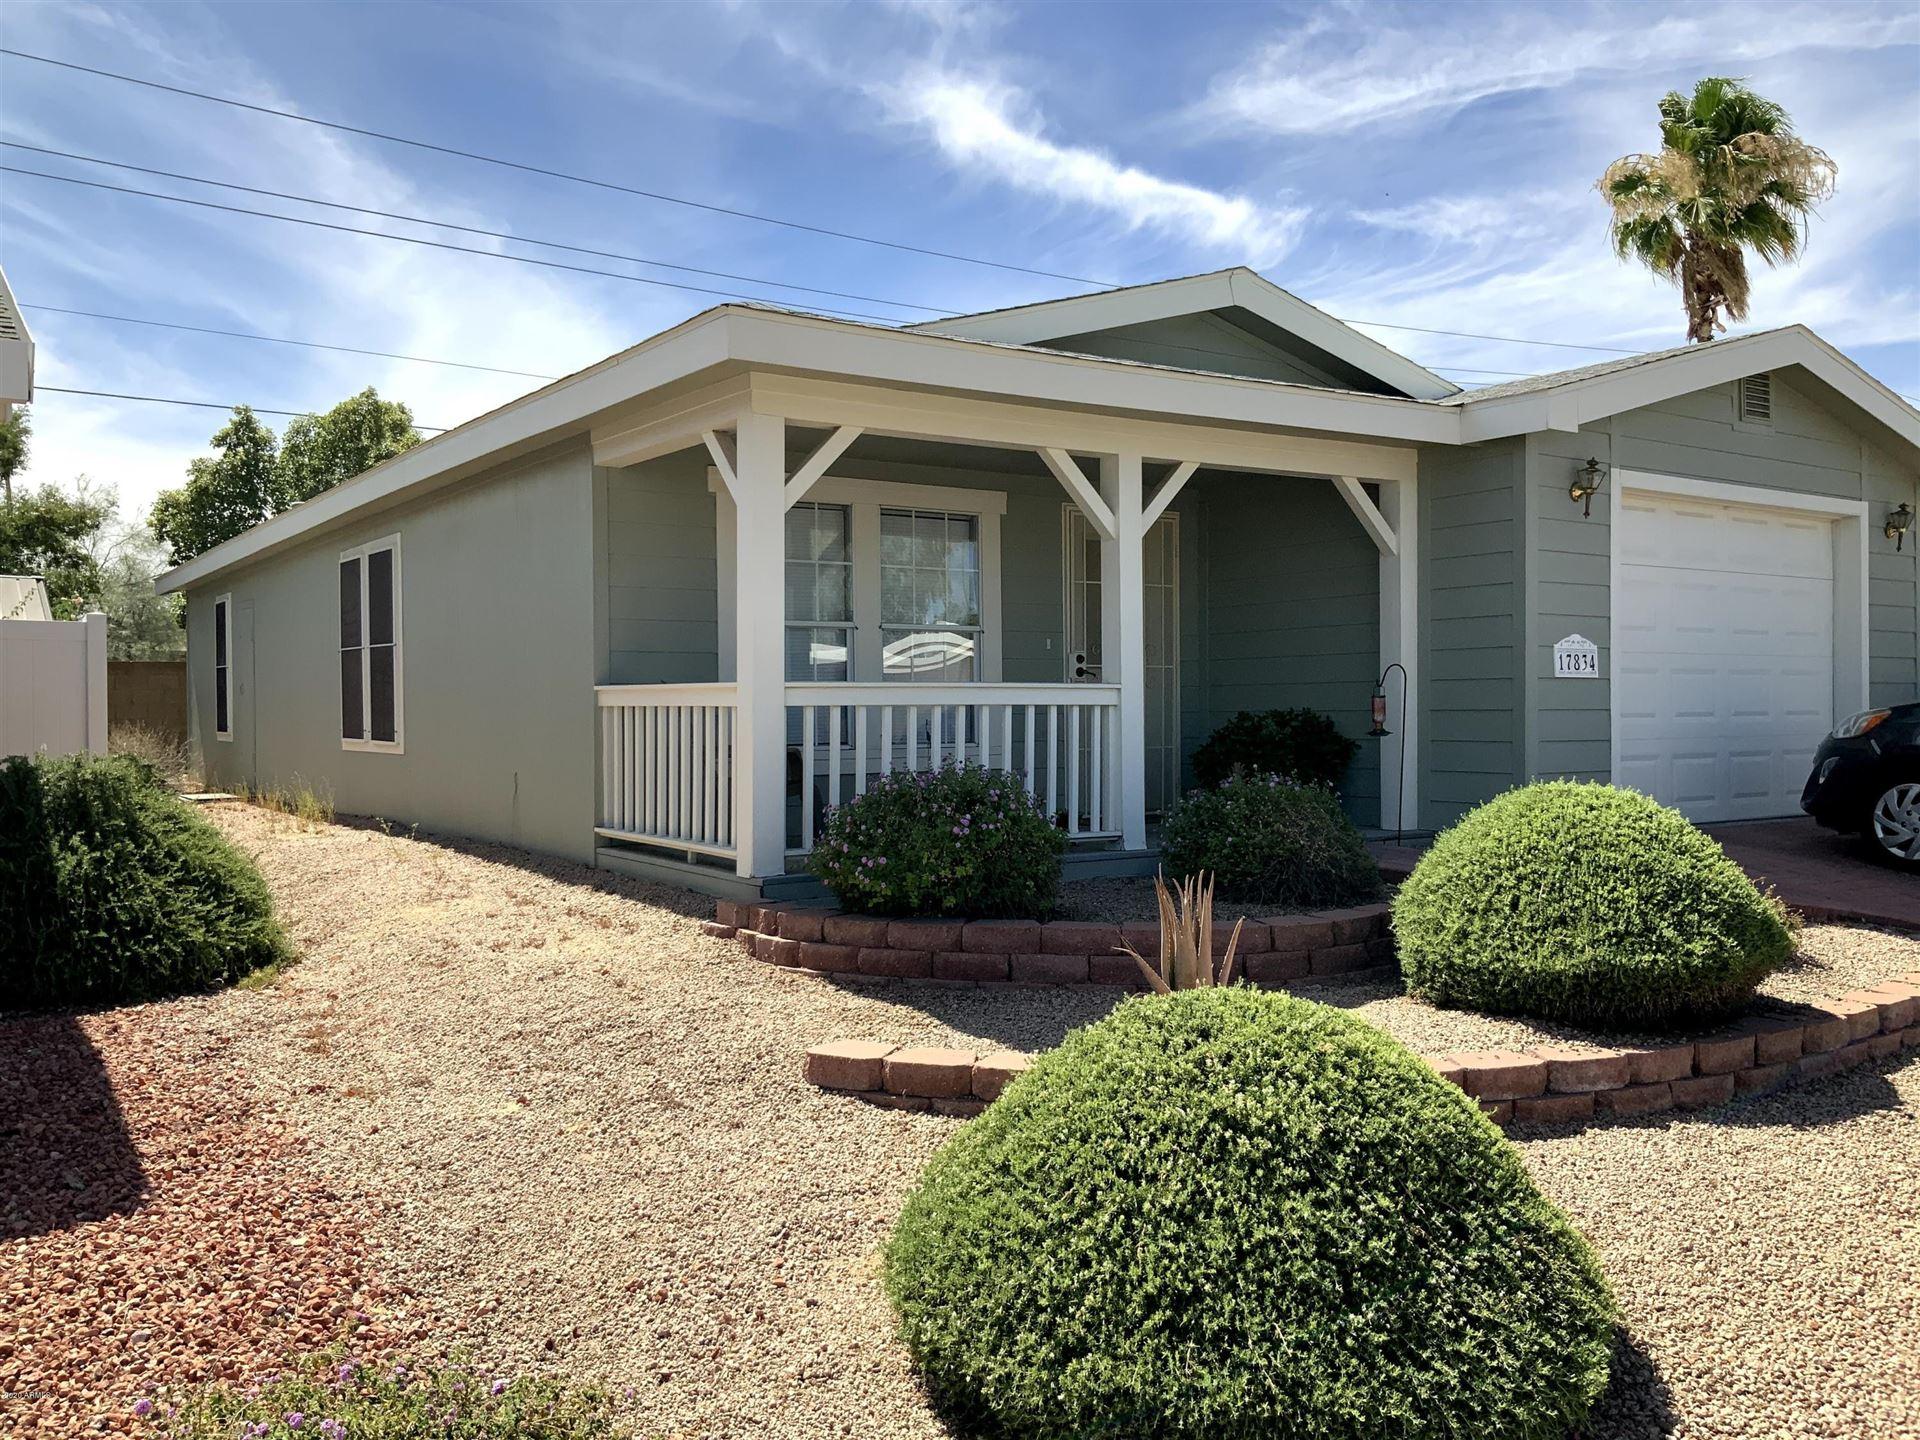 17801 N 16th Place, Phoenix, AZ 85022 - MLS#: 6114444